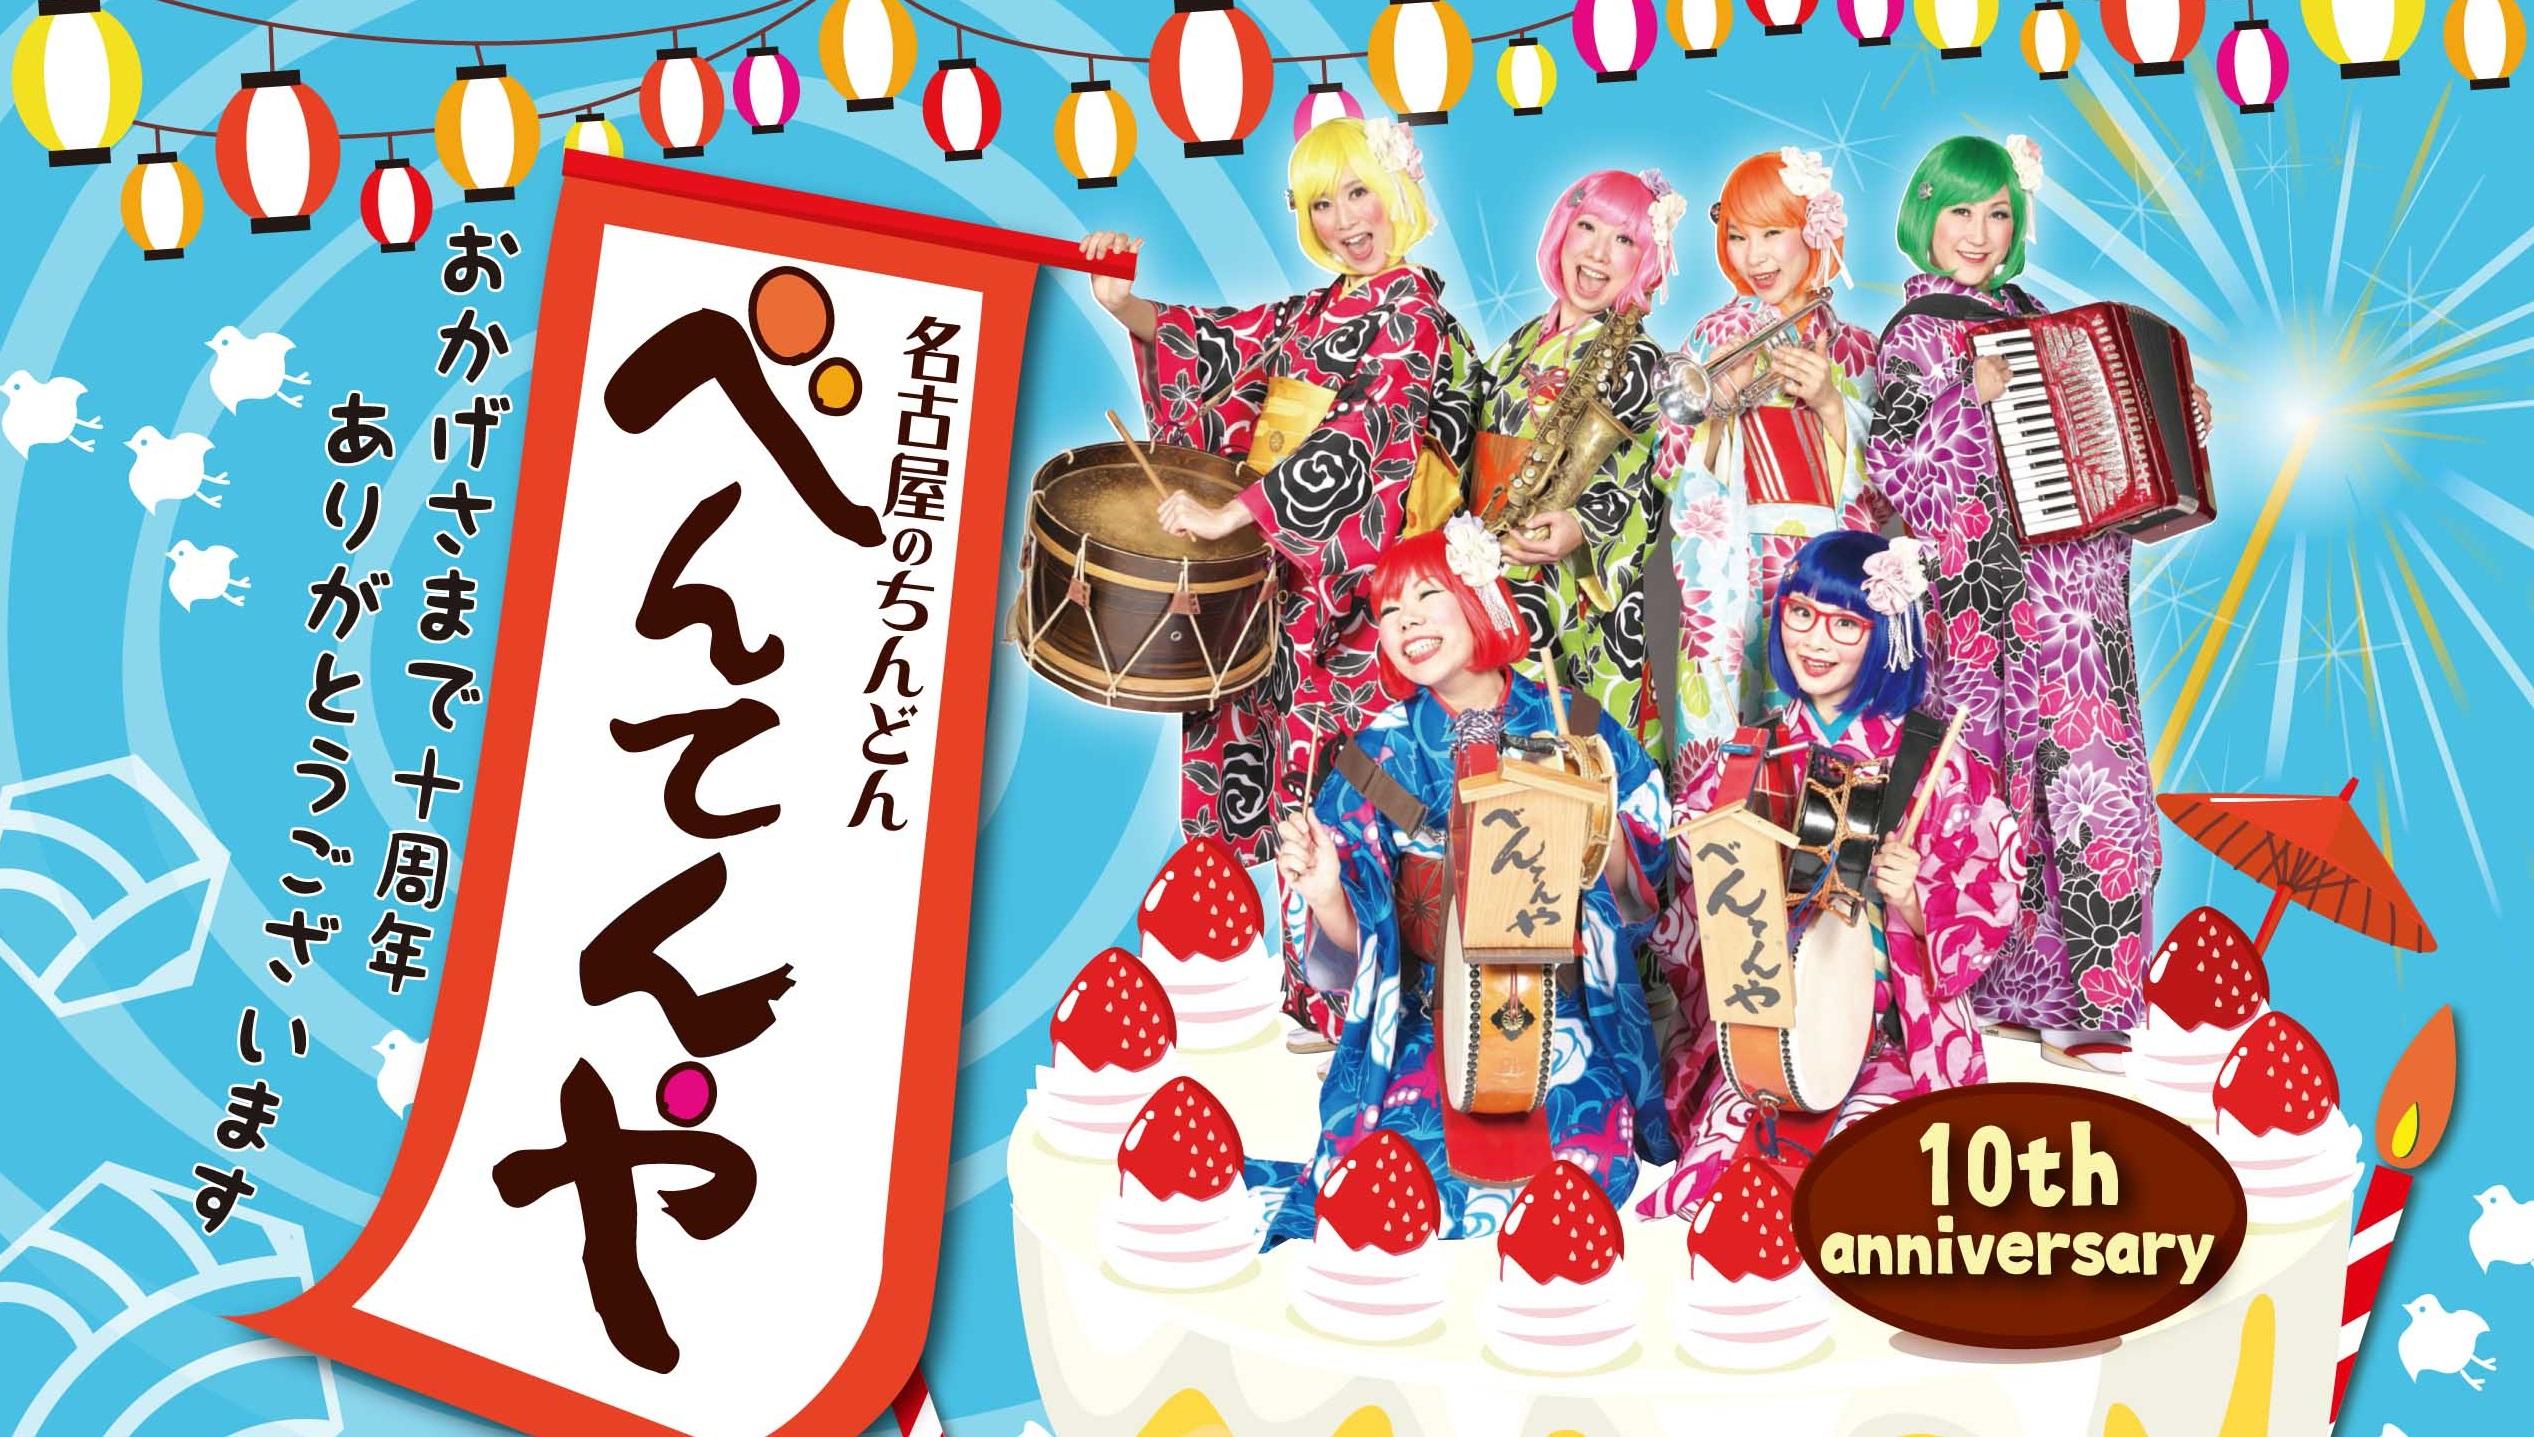 (Japanese) 2018年6月30日 べんてんや旗揚げ10周年記念公演@大須演芸場 (→無事終了しました♪)